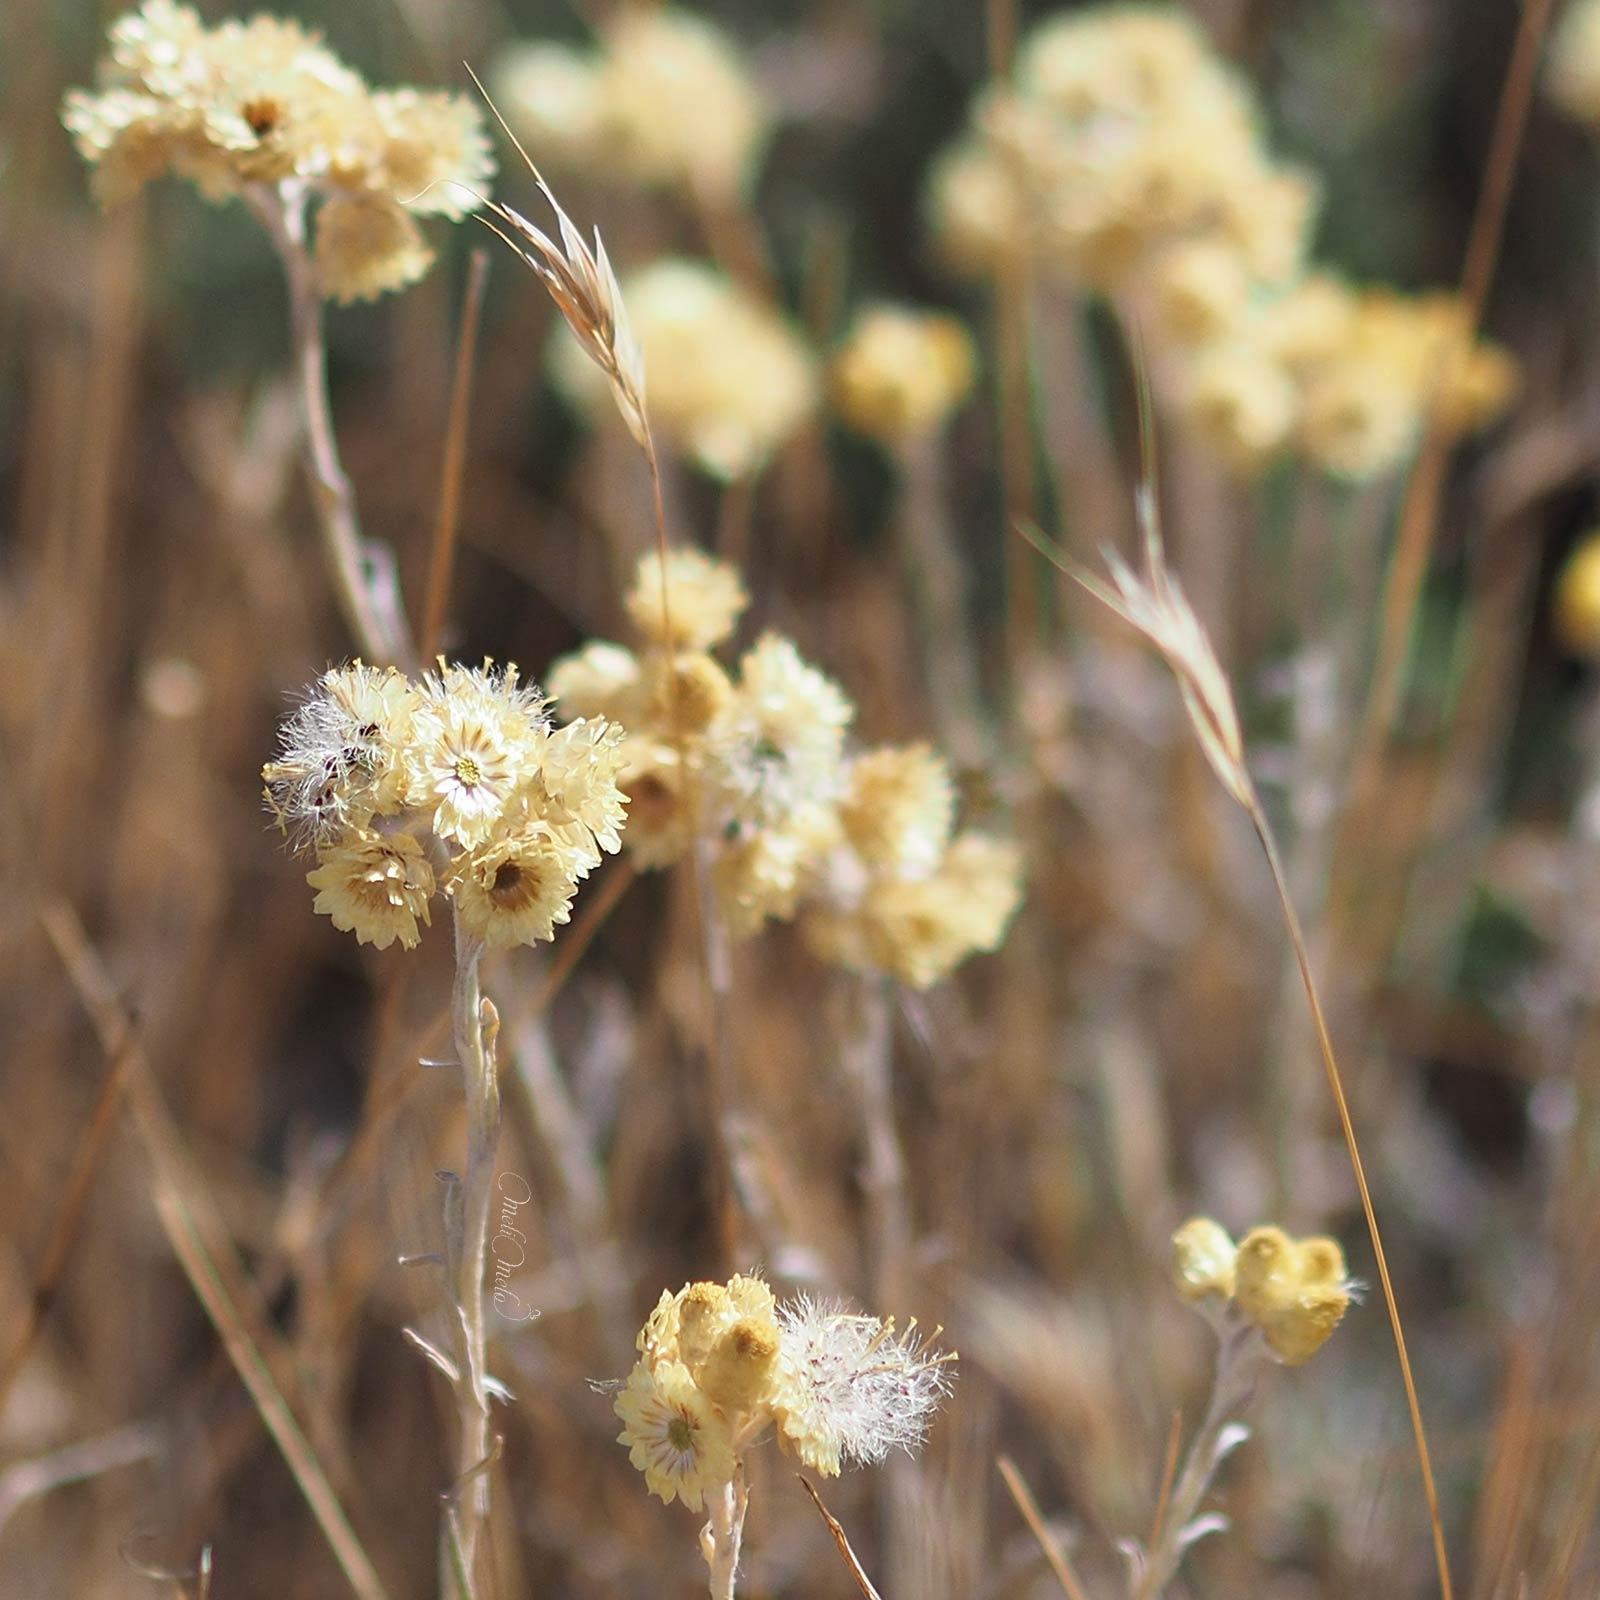 fleurs-immortelle-helichrysum-stoechas-moench-siempreviva-montes-torozos-yoniquenews-laboutiquedemelimelo